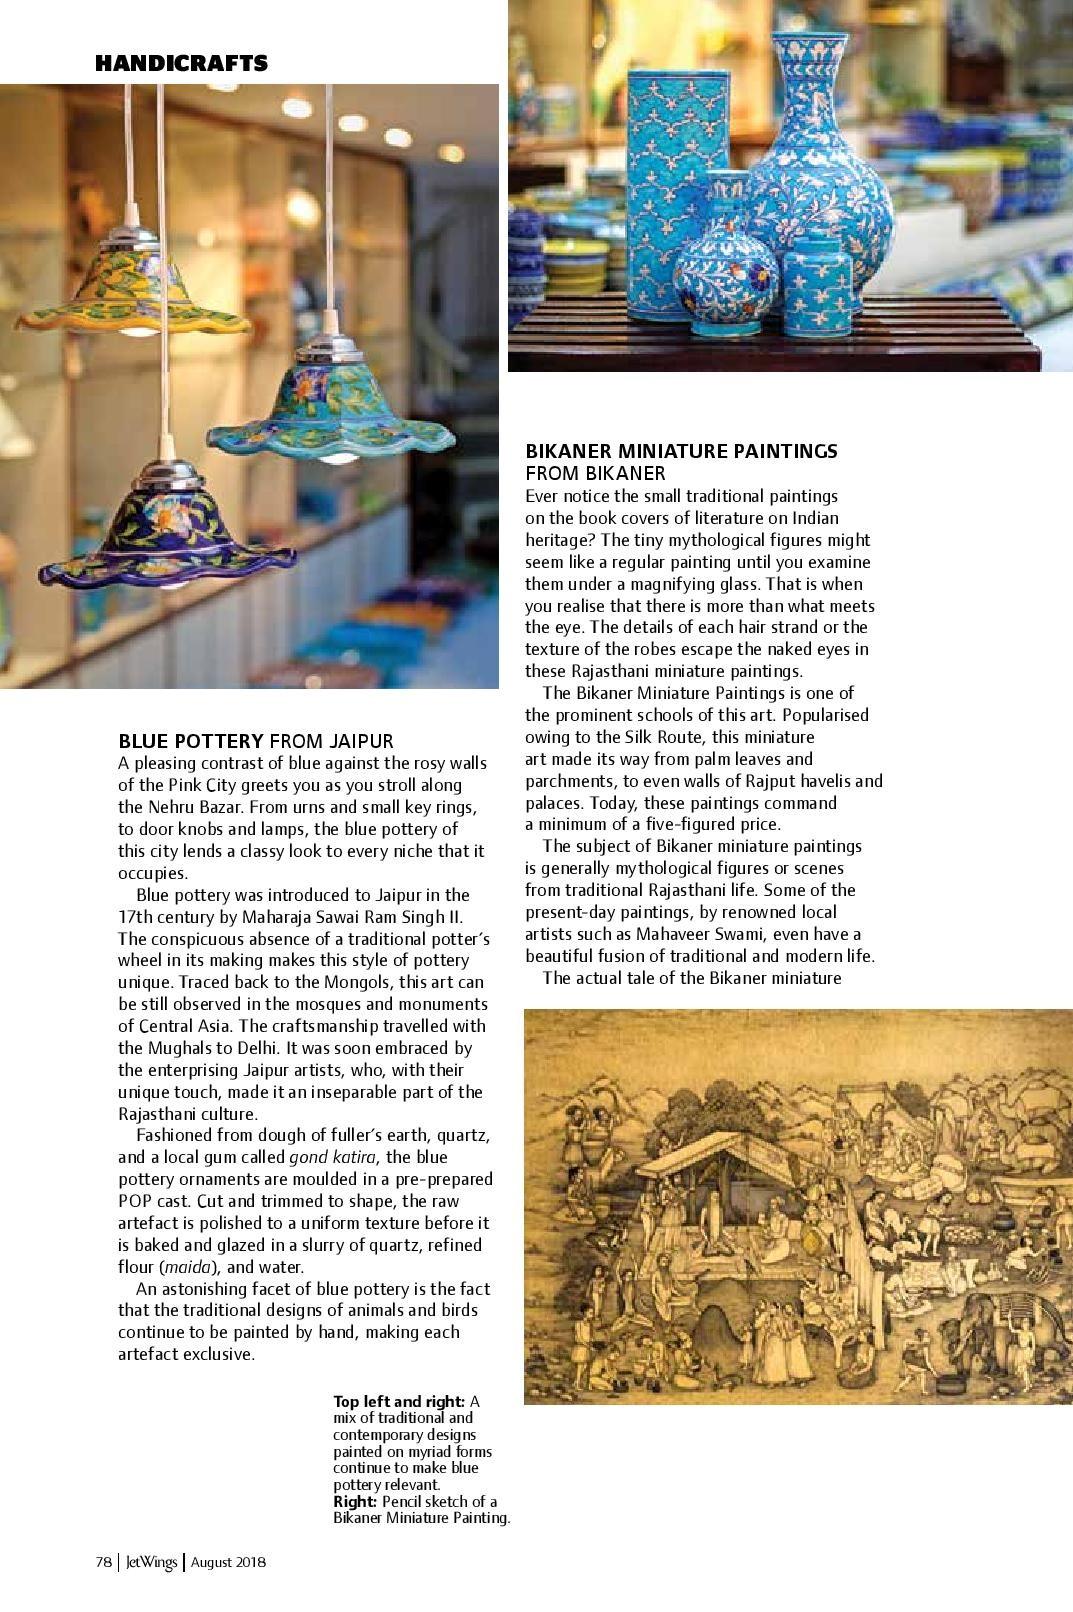 Neerja Blue Pottery featured in Jetwings